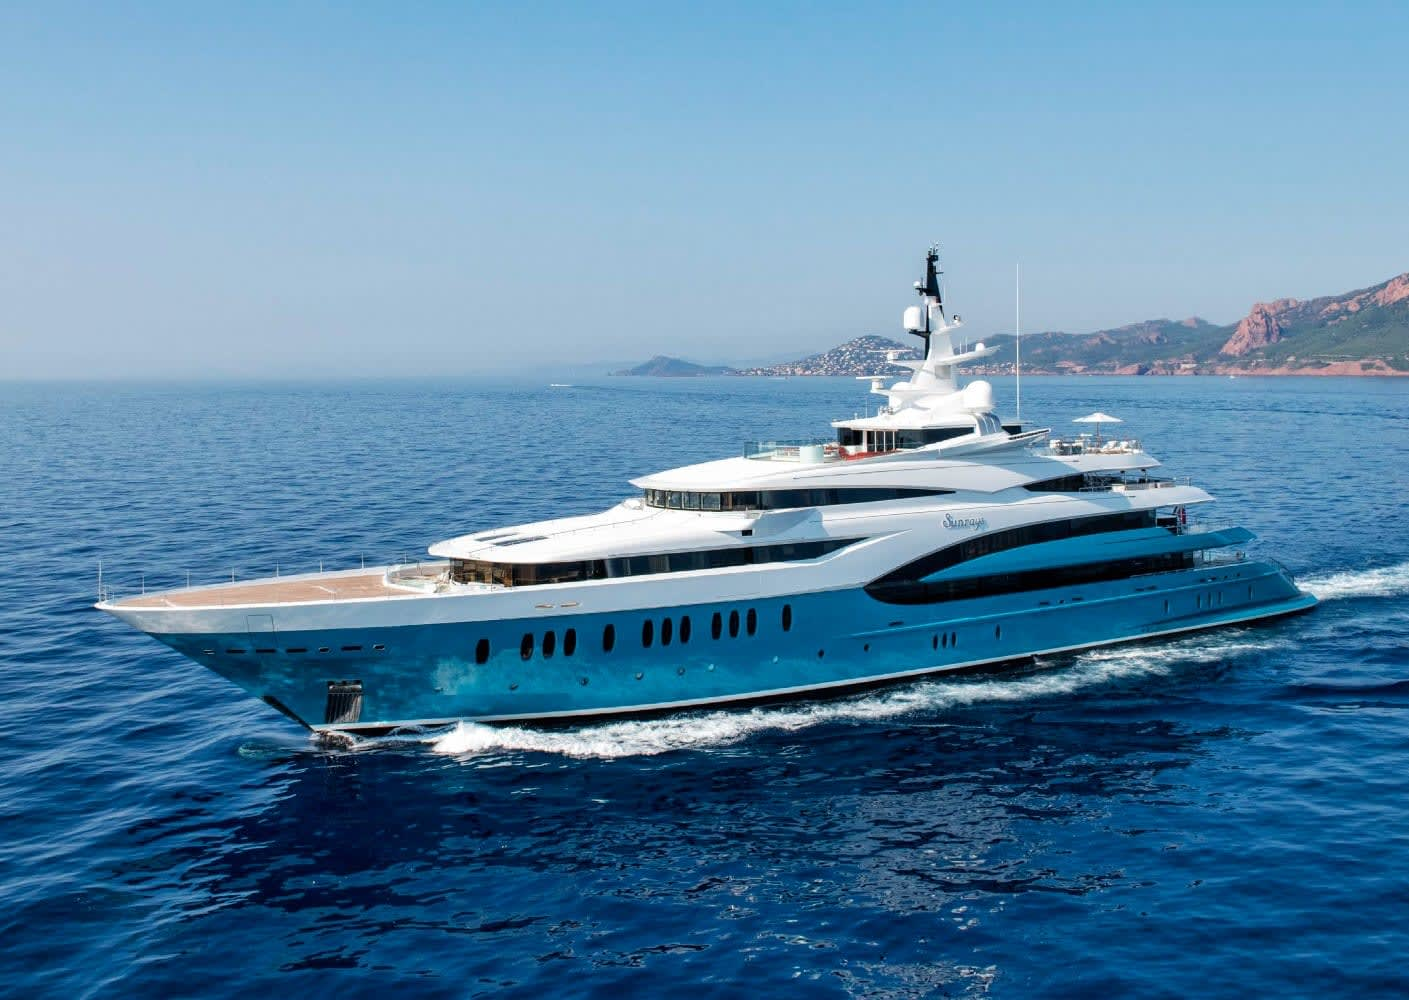 Image of Sunrays 85.5M (280.5FT) motor yacht